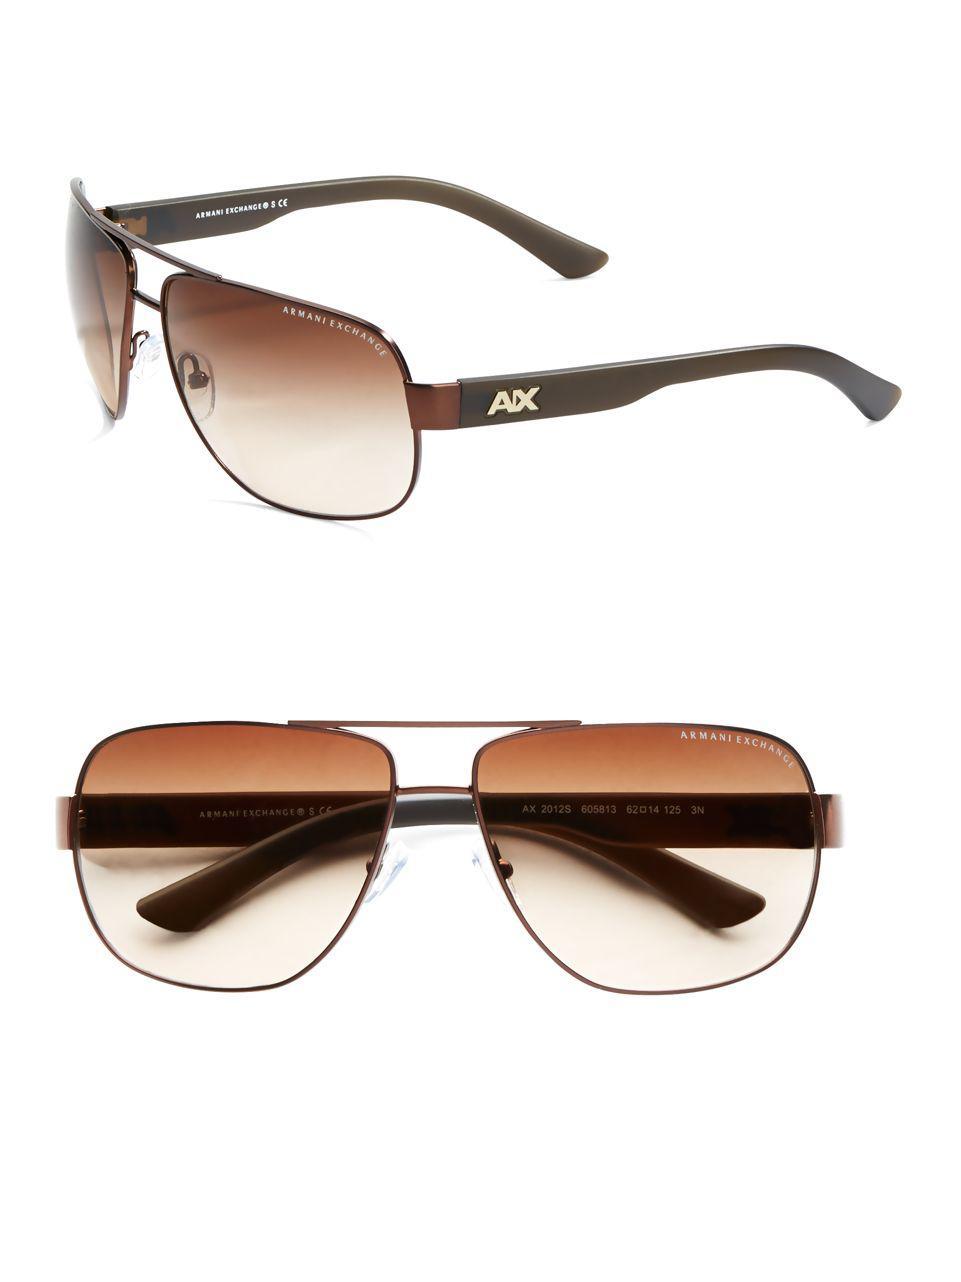 36f7caf53 Armani Exchange - Brown 63.5mm Modern Aviator Sunglasses for Men - Lyst.  View fullscreen